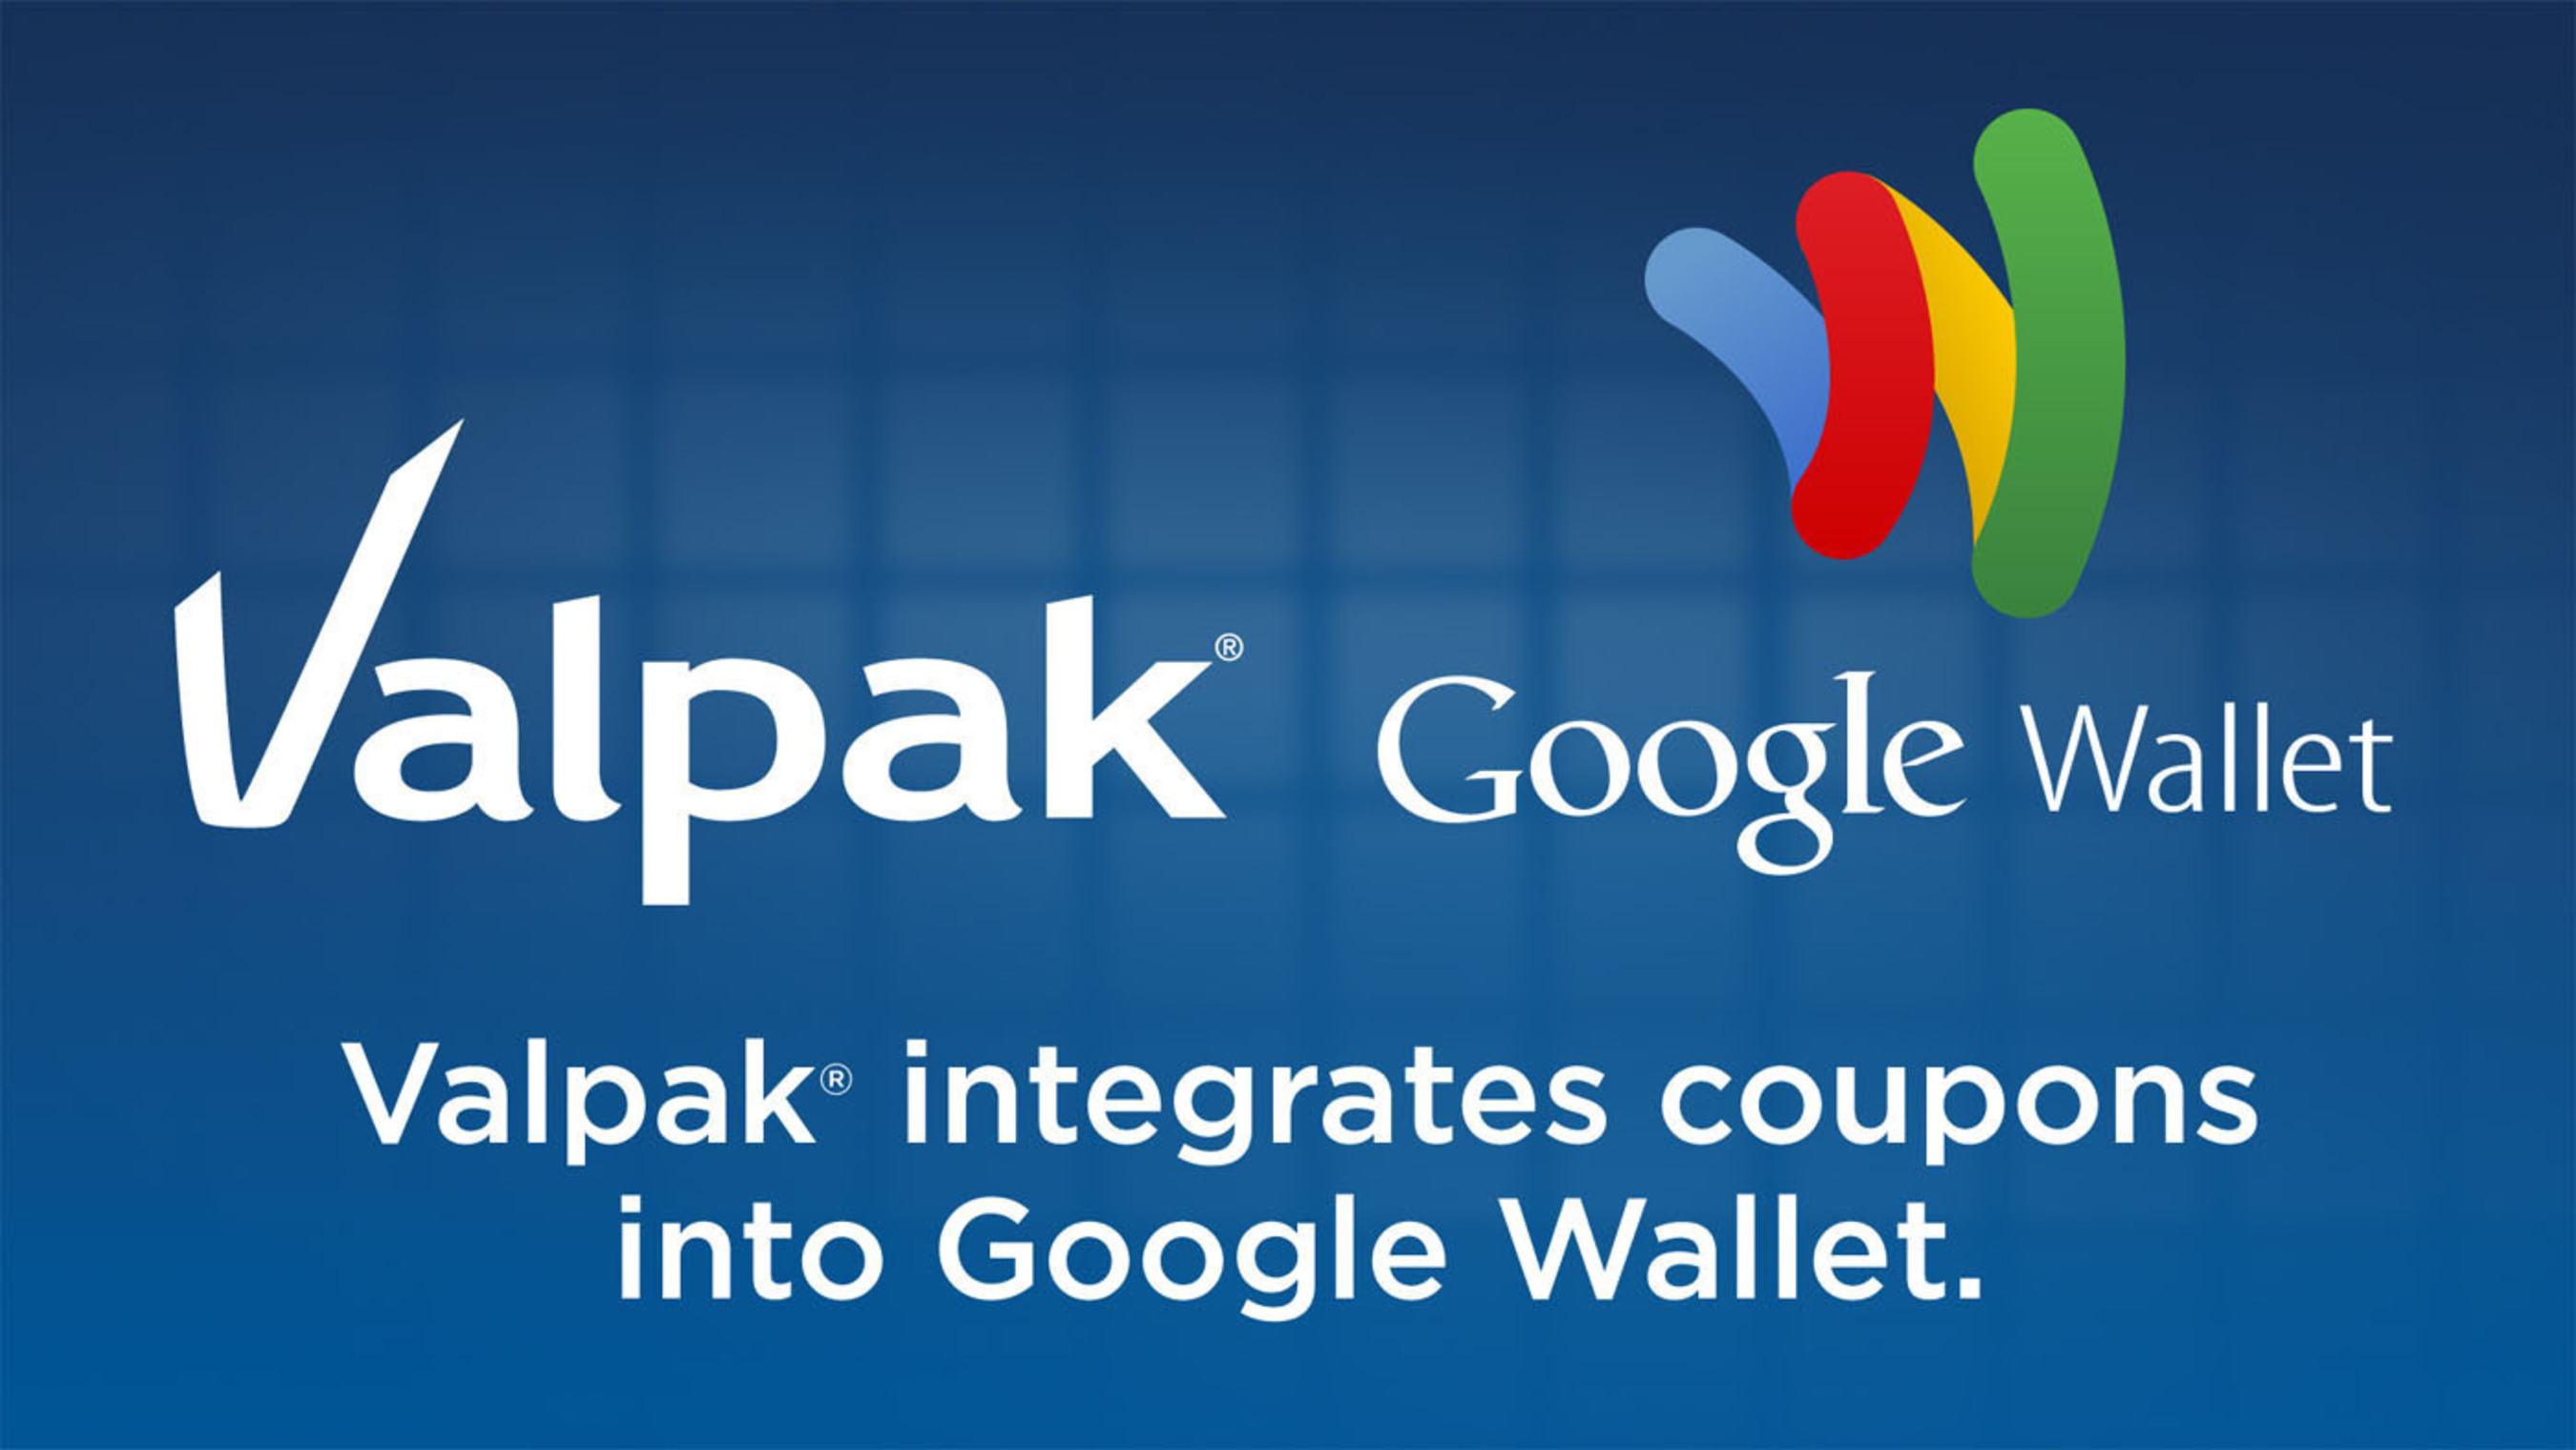 Valpak Integrates Coupons into Google Wallet. (PRNewsFoto/Valpak) (PRNewsFoto/VALPAK)